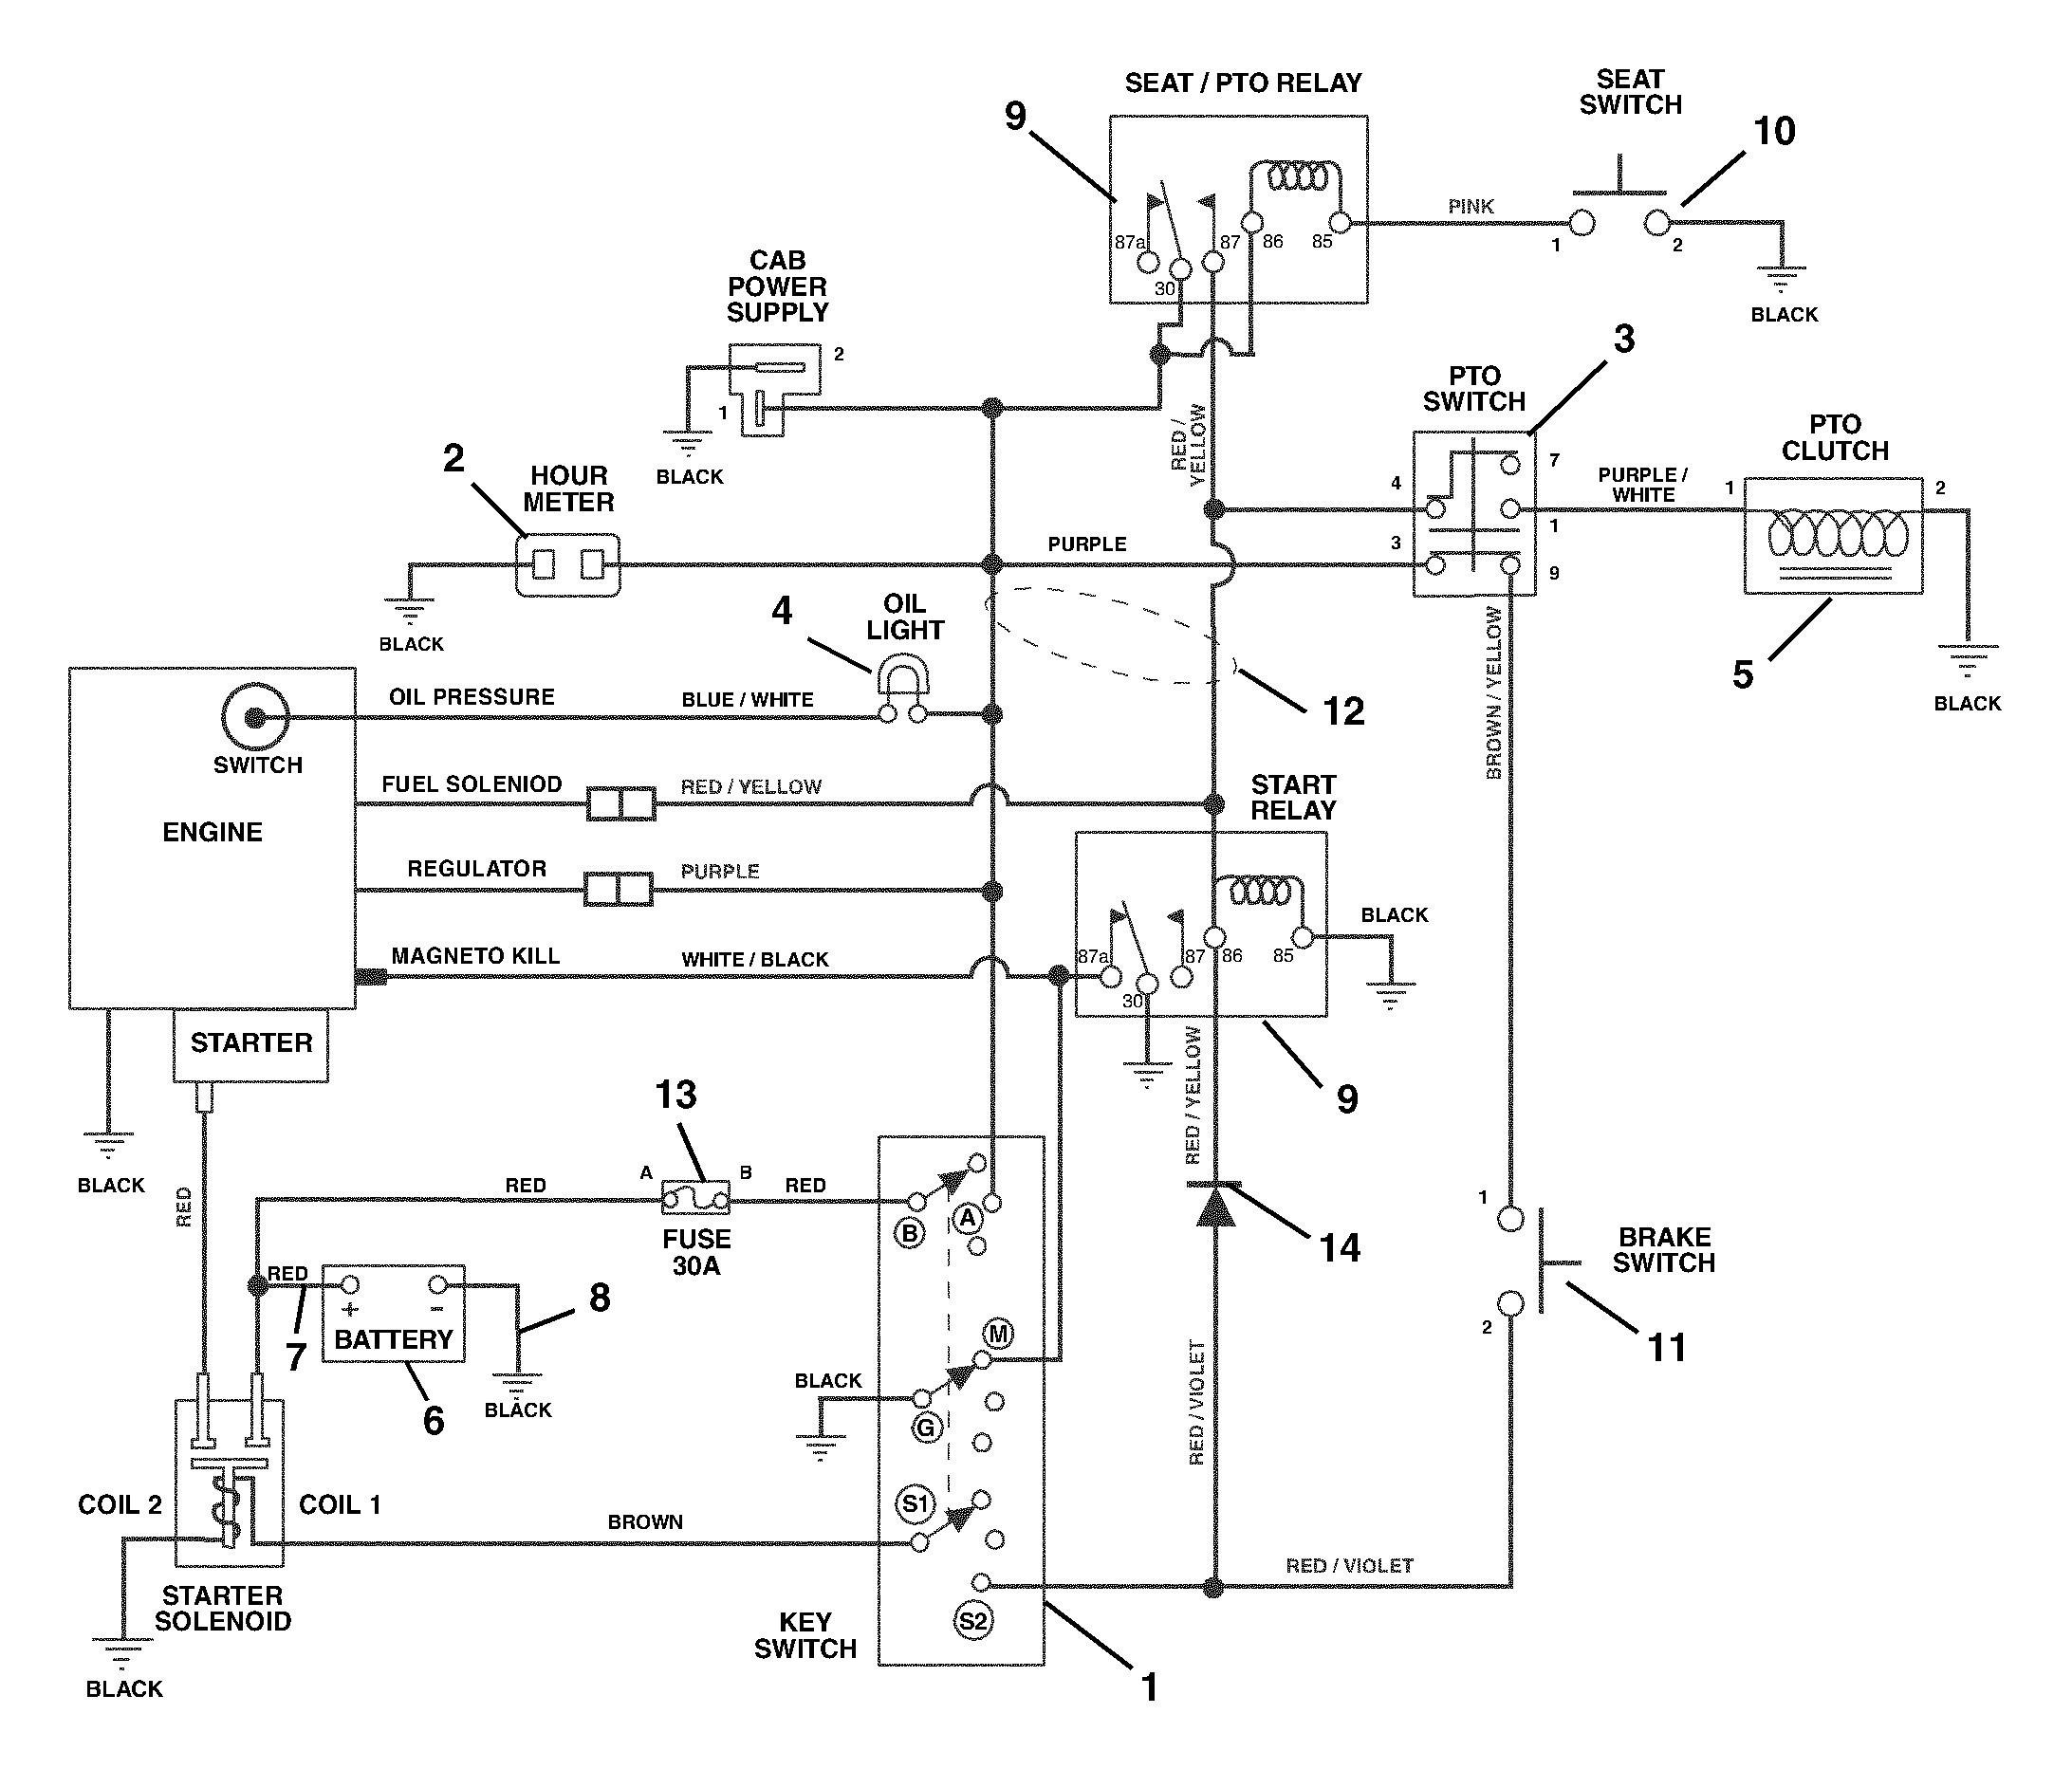 Luxury Briggs And Stratton Magneto Wiring Diagram Striking